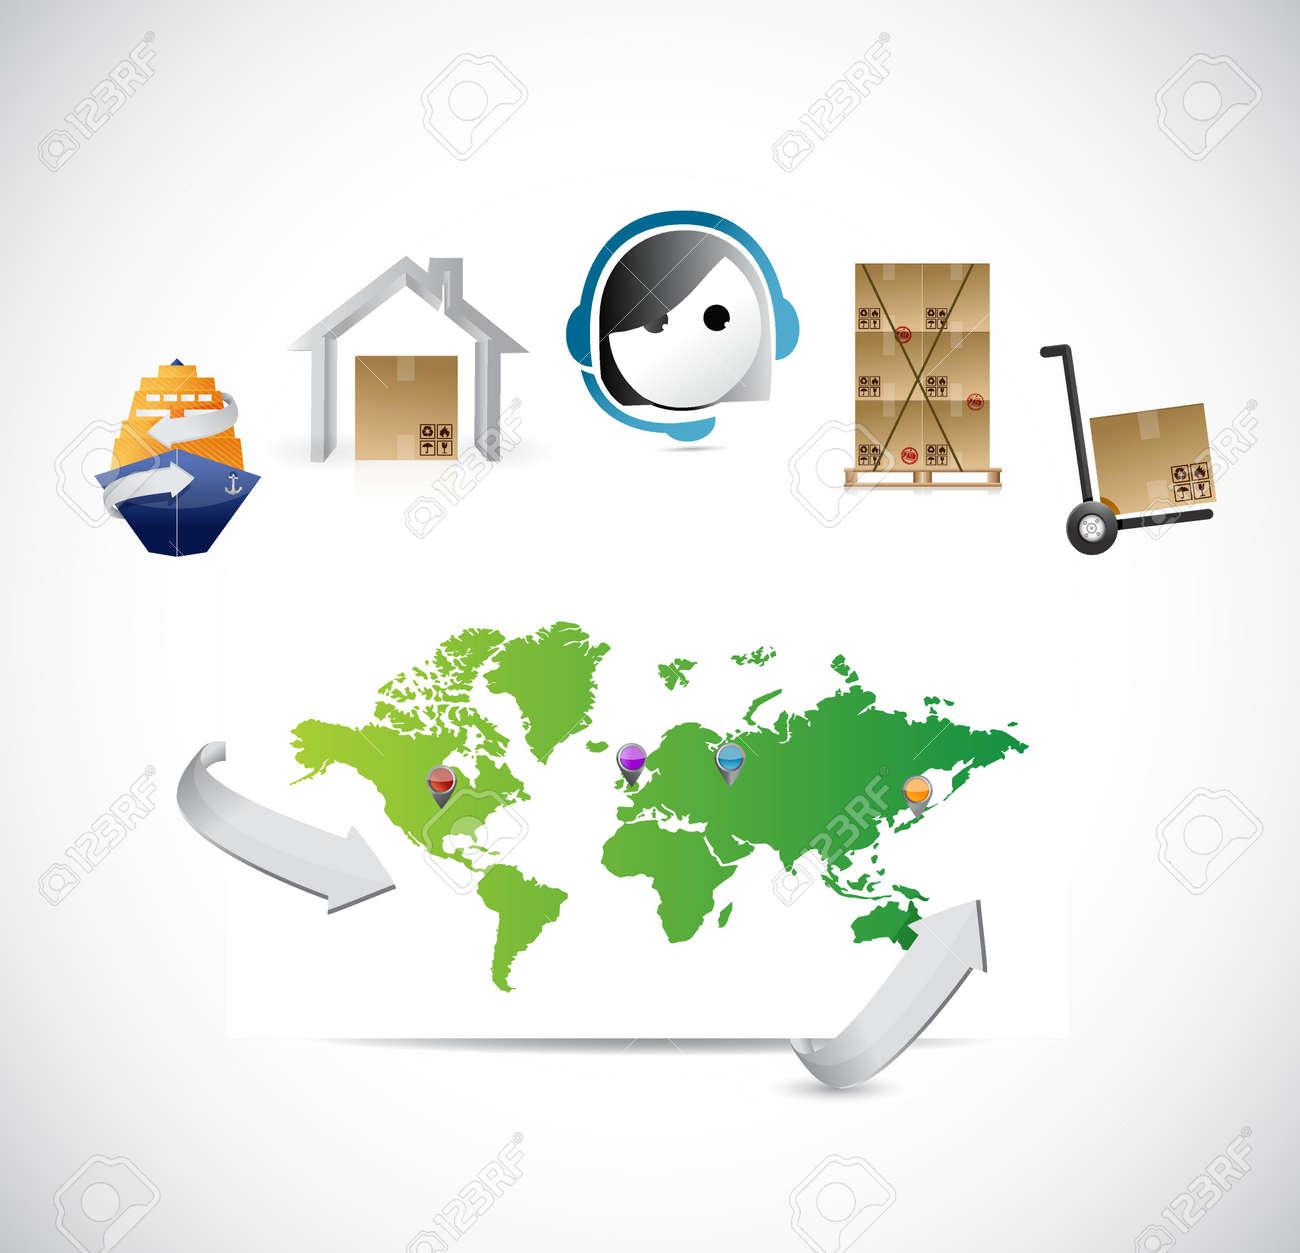 World map customer service logistics control illustration design world map customer service logistics control illustration design stock vector 50707964 gumiabroncs Gallery